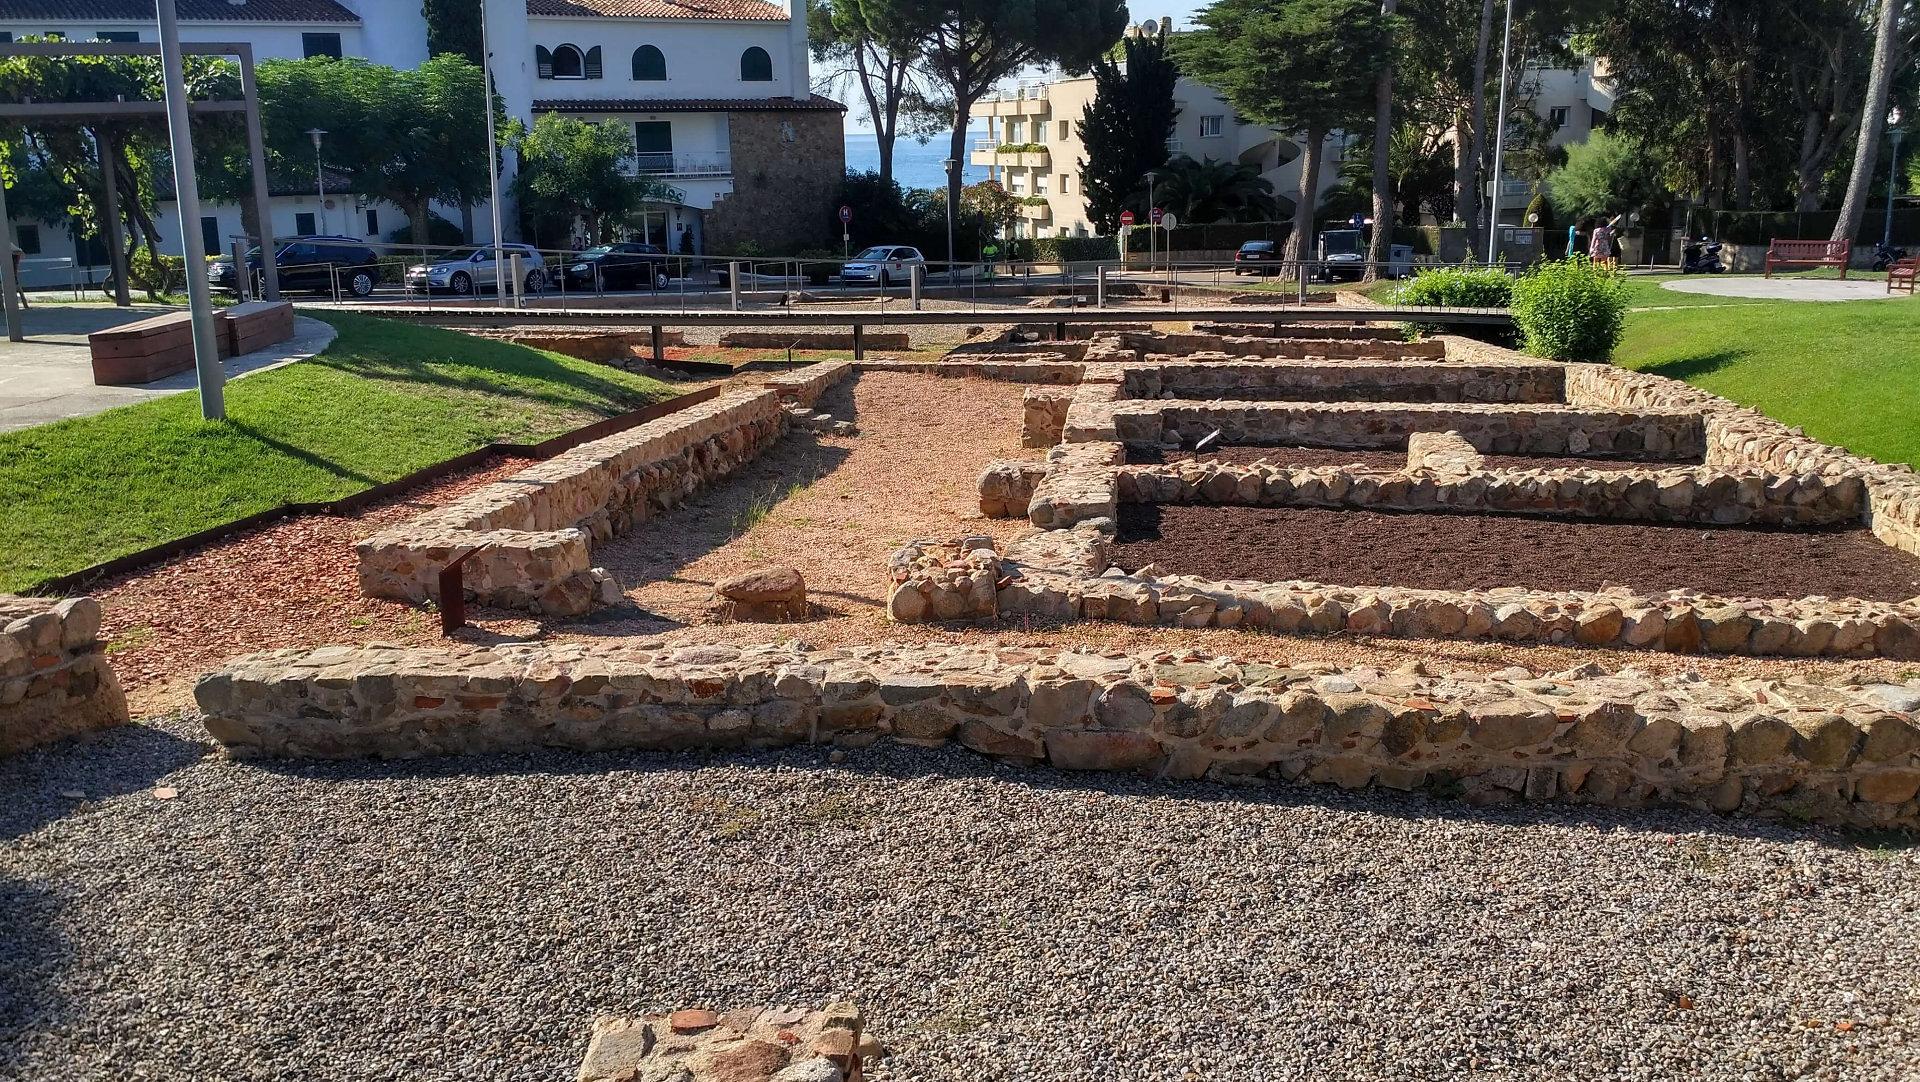 Las 10 visitas culturales top de Llafranc